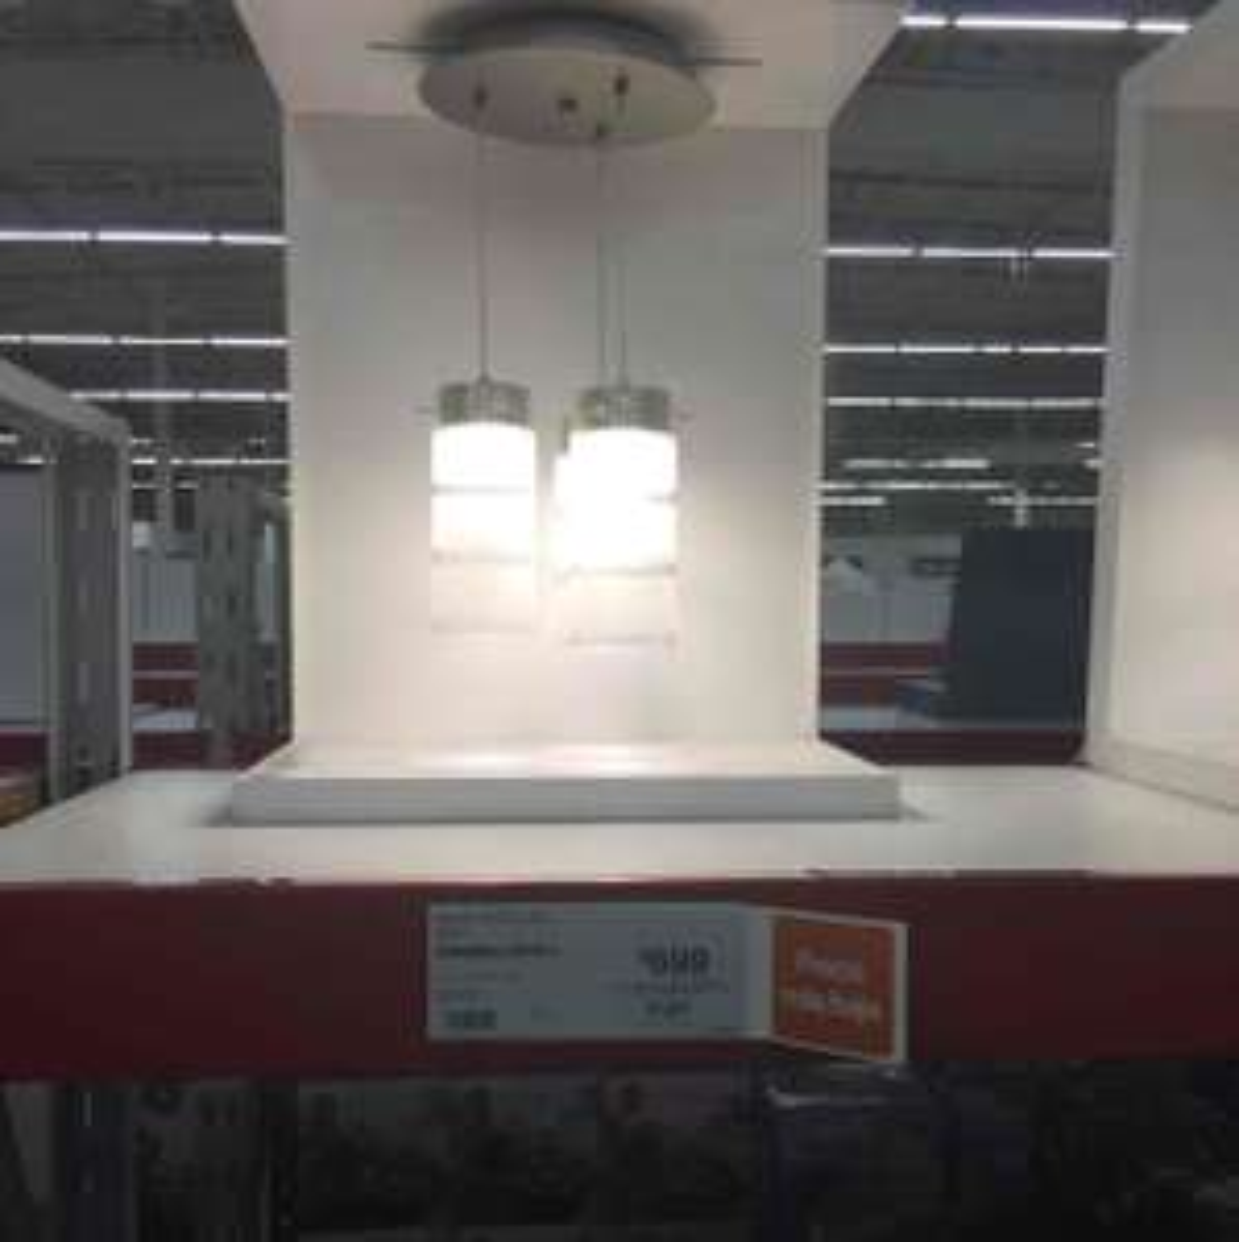 Sam's Club Chetumal: lámparas pendante LED a $699